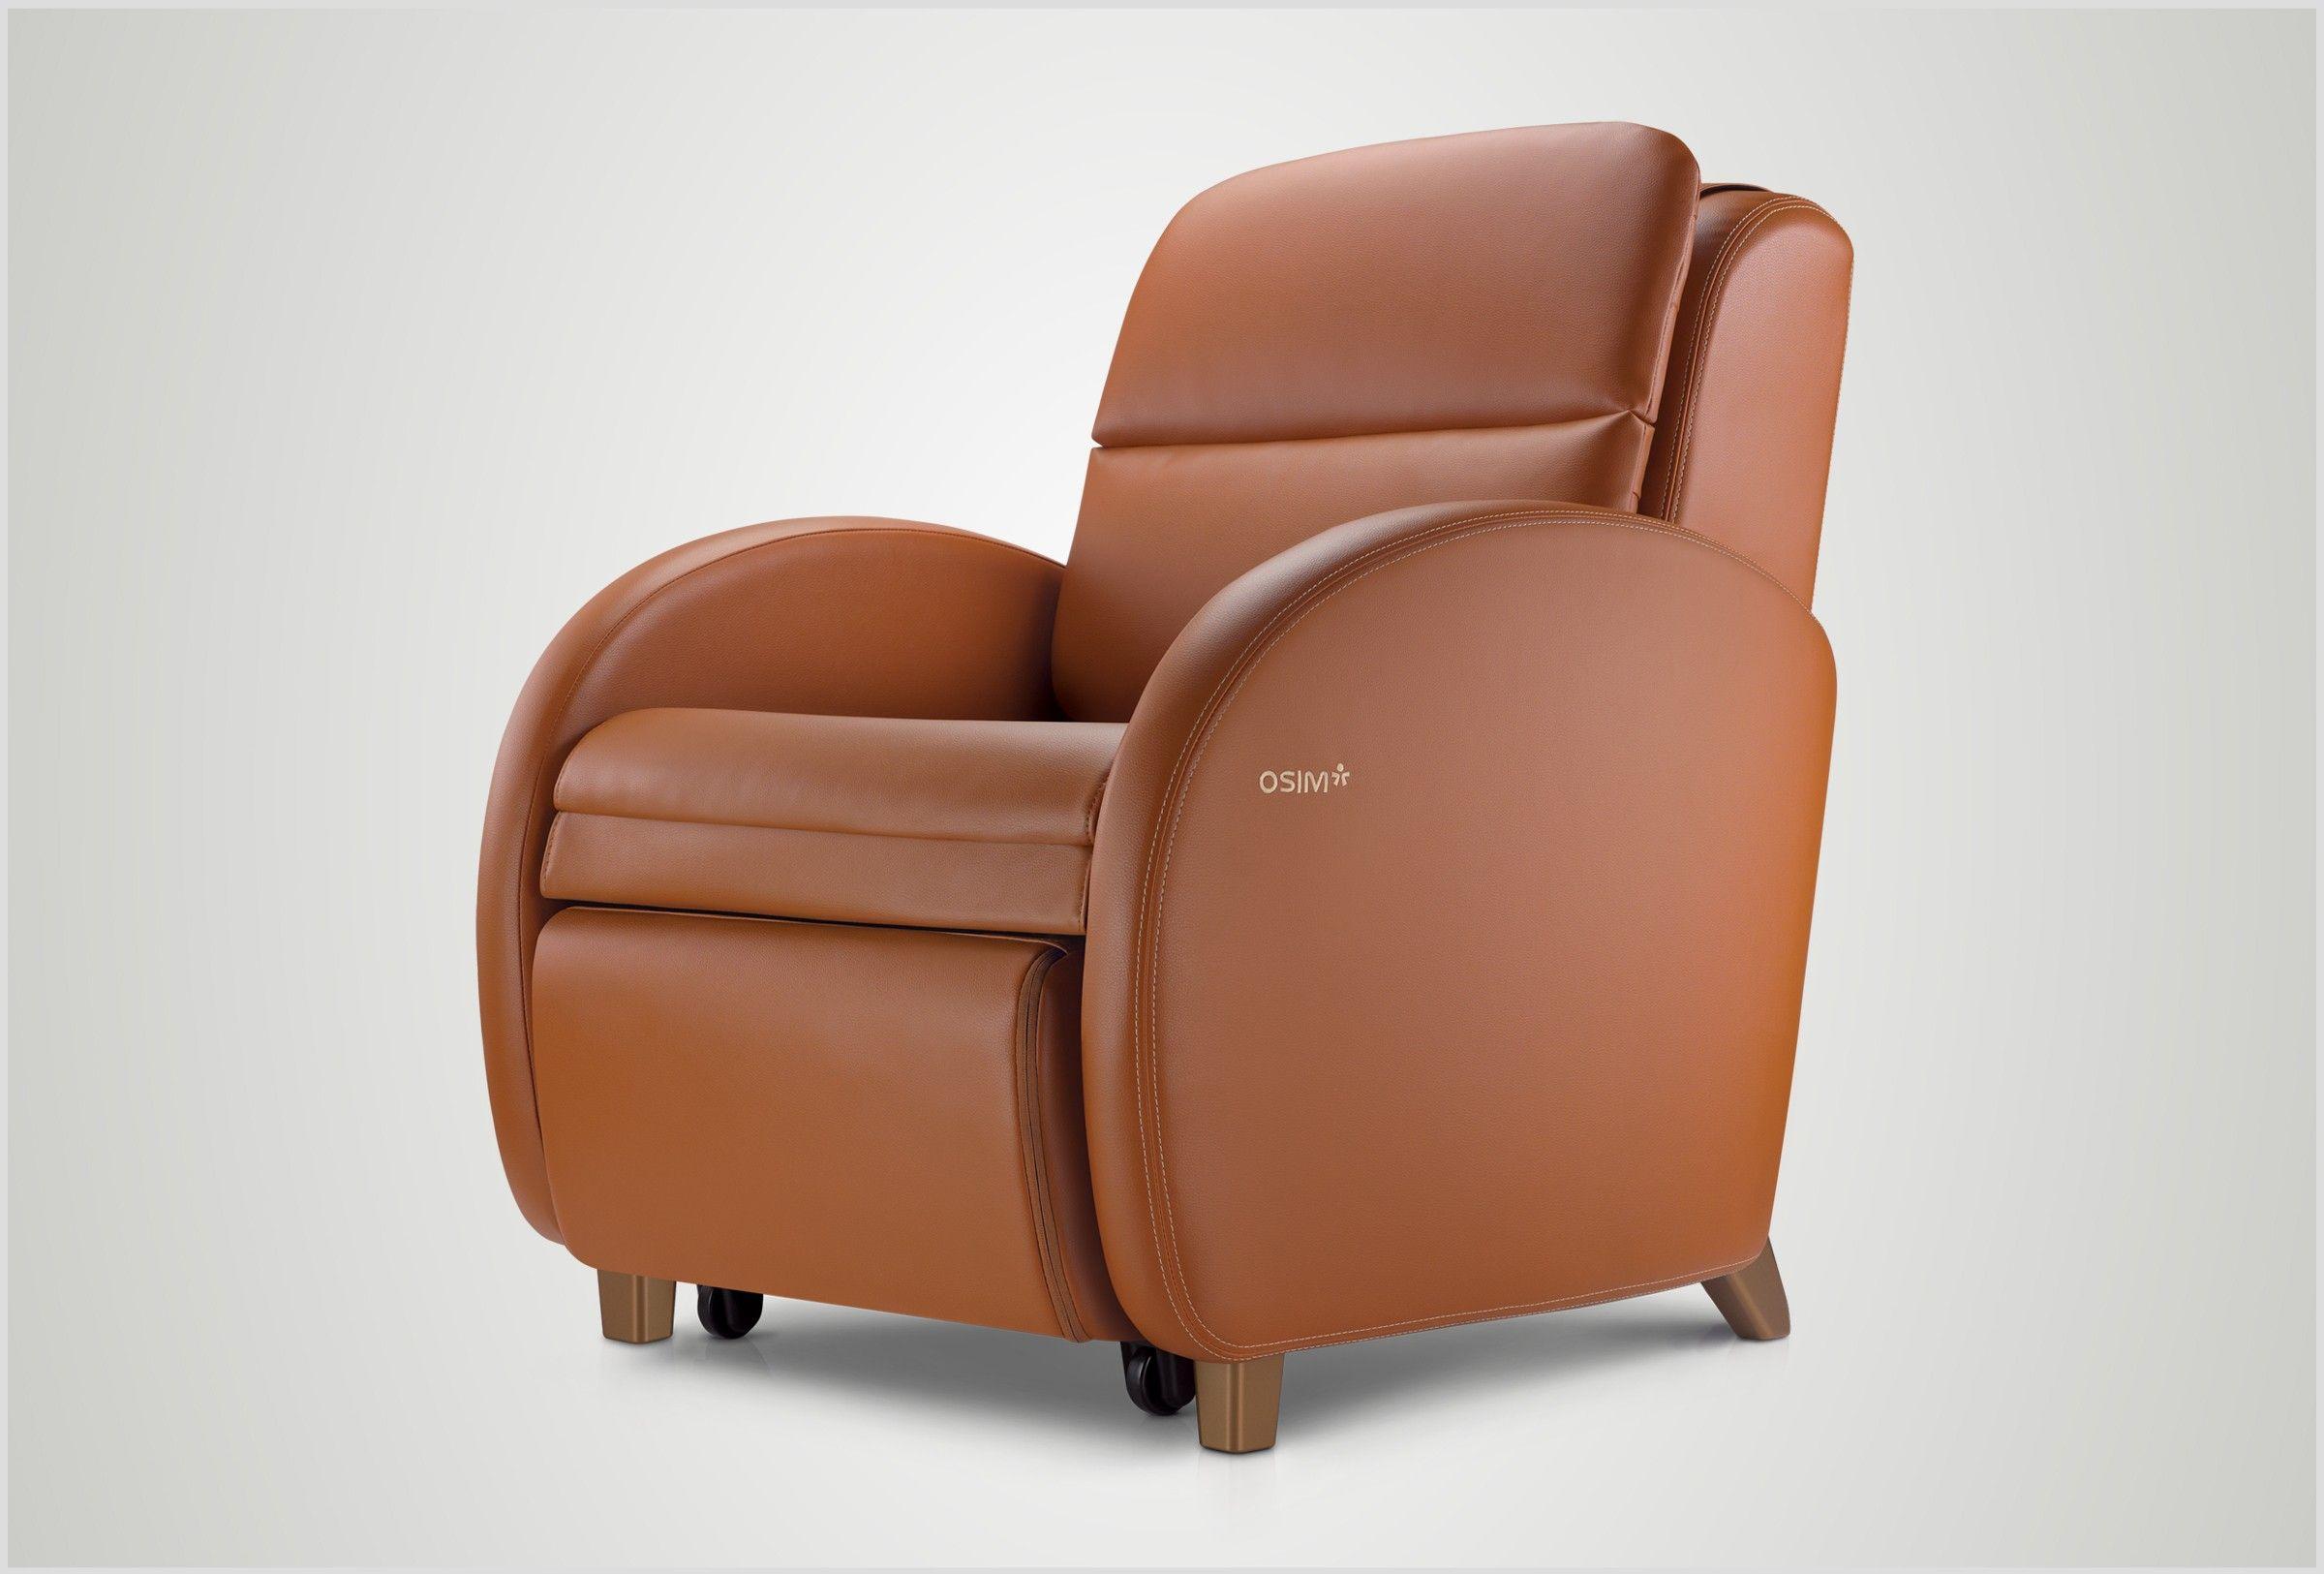 uDiva Classic Massage Sofa Chair, Massage chairs, Lounge